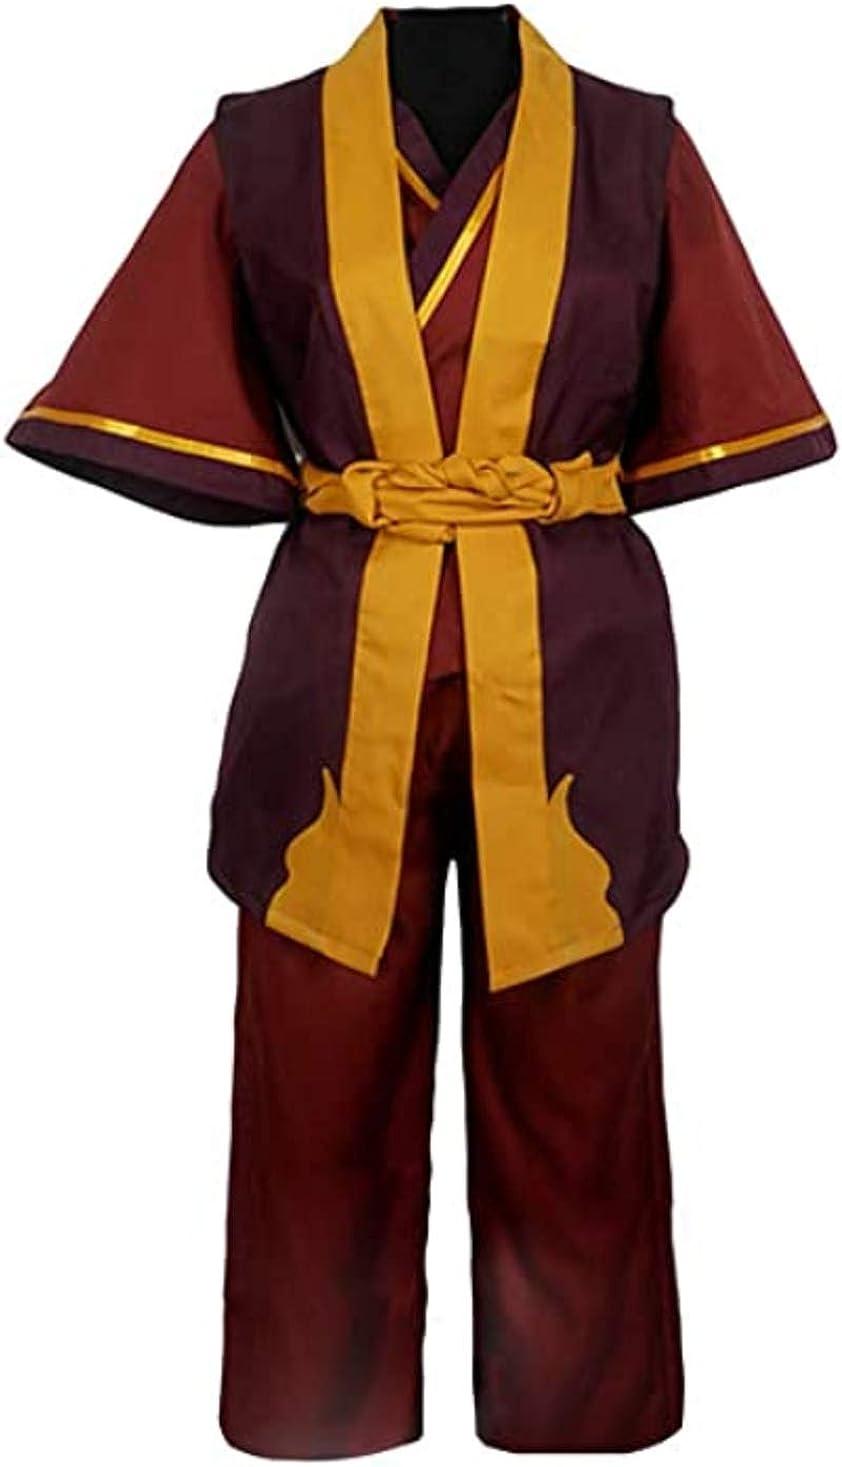 Limited Special Price Vamy The Last Airbender Zuko Prince Uniform Cosplay Costume Regular dealer